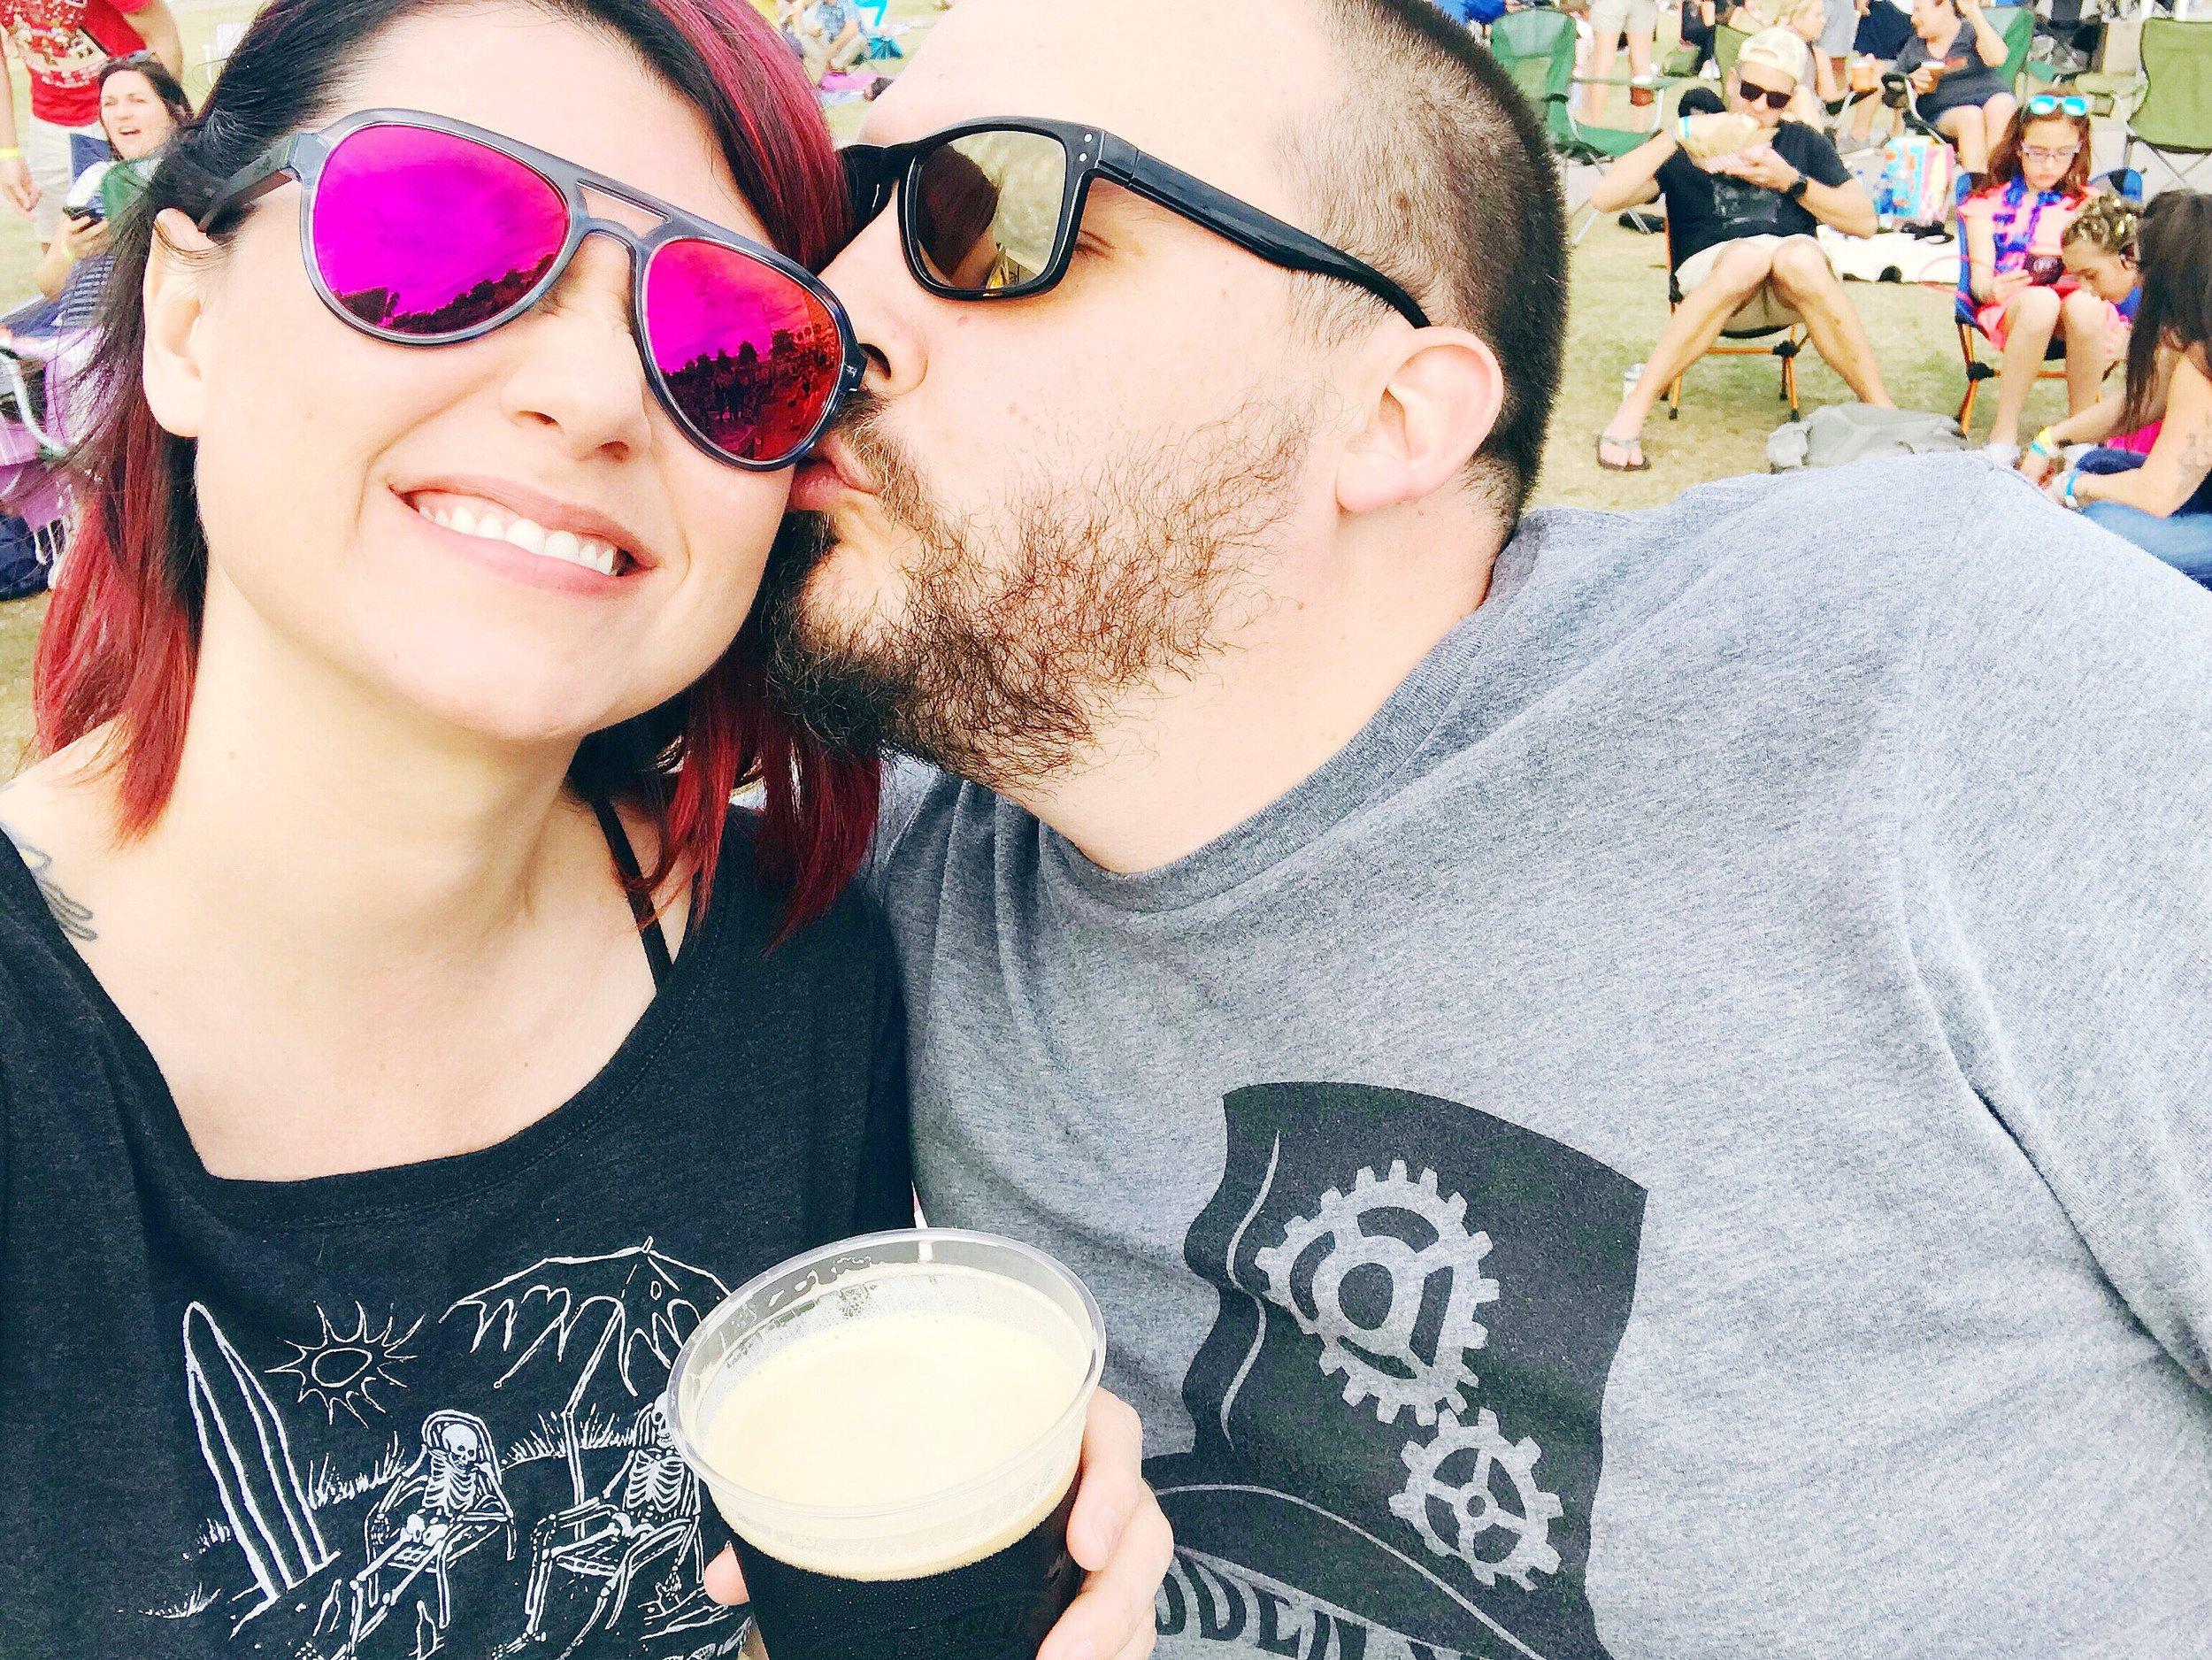 Selfie Mode - Teresa and Andrew at Gasparilla Music Fest